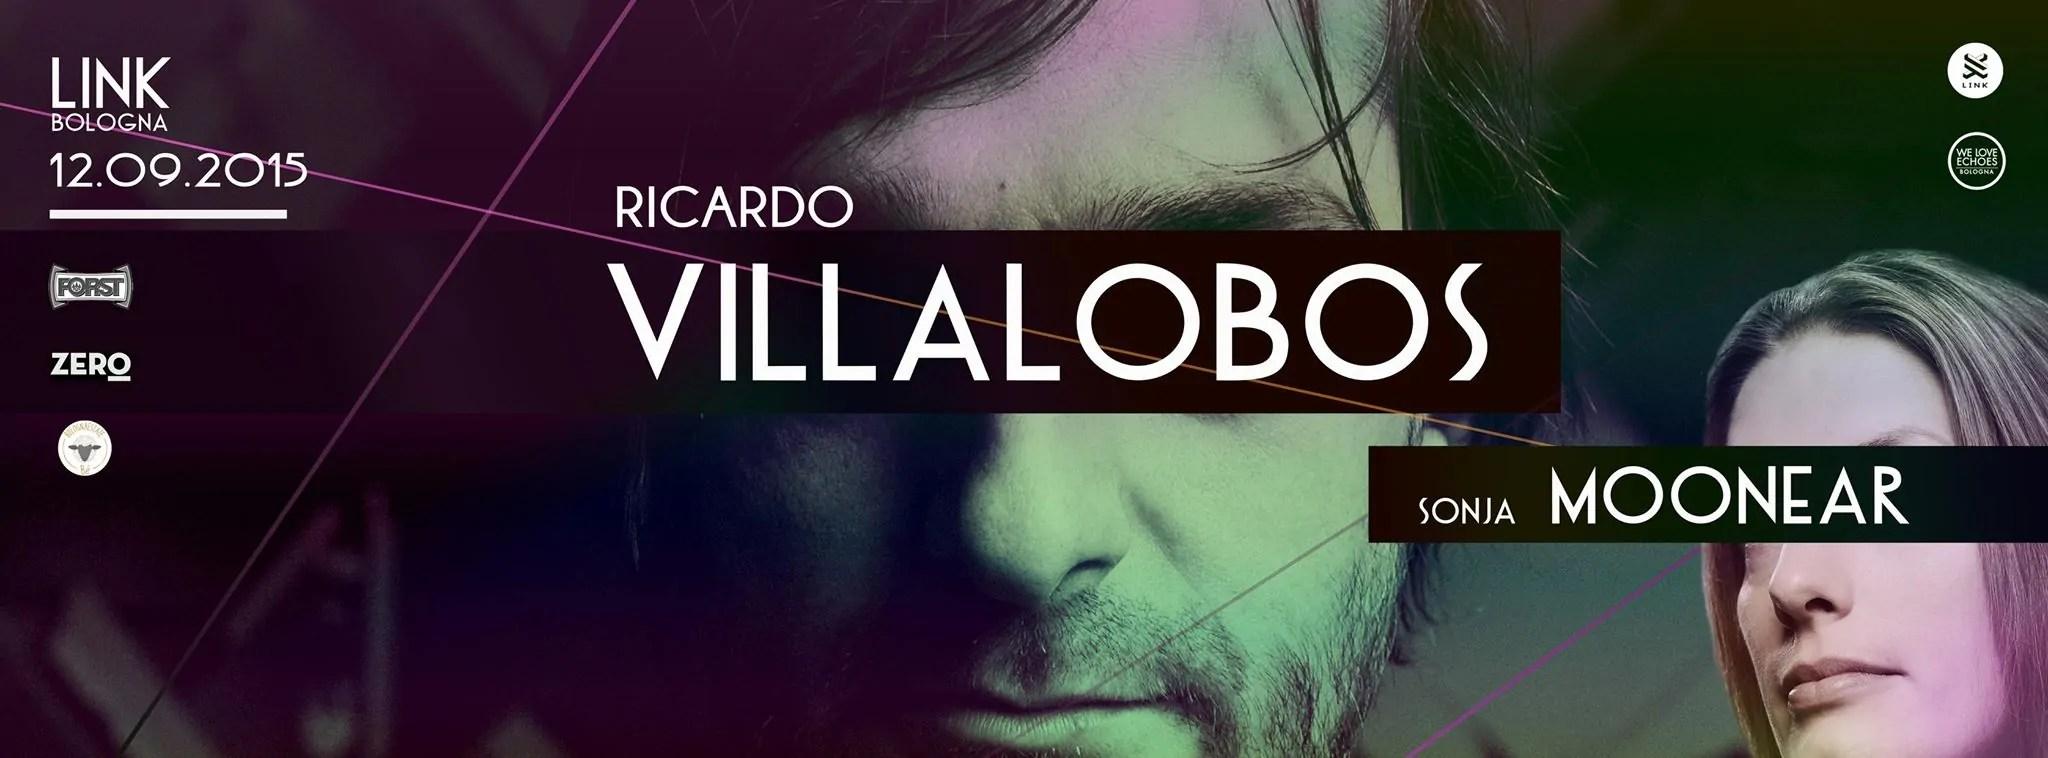 SABATO 12/09/2015 LINK BOLOGNA RICARDO VILLALOBOS + PREZZI PREVENDITE BIGLIETTI TAVOLI + PULLMAN